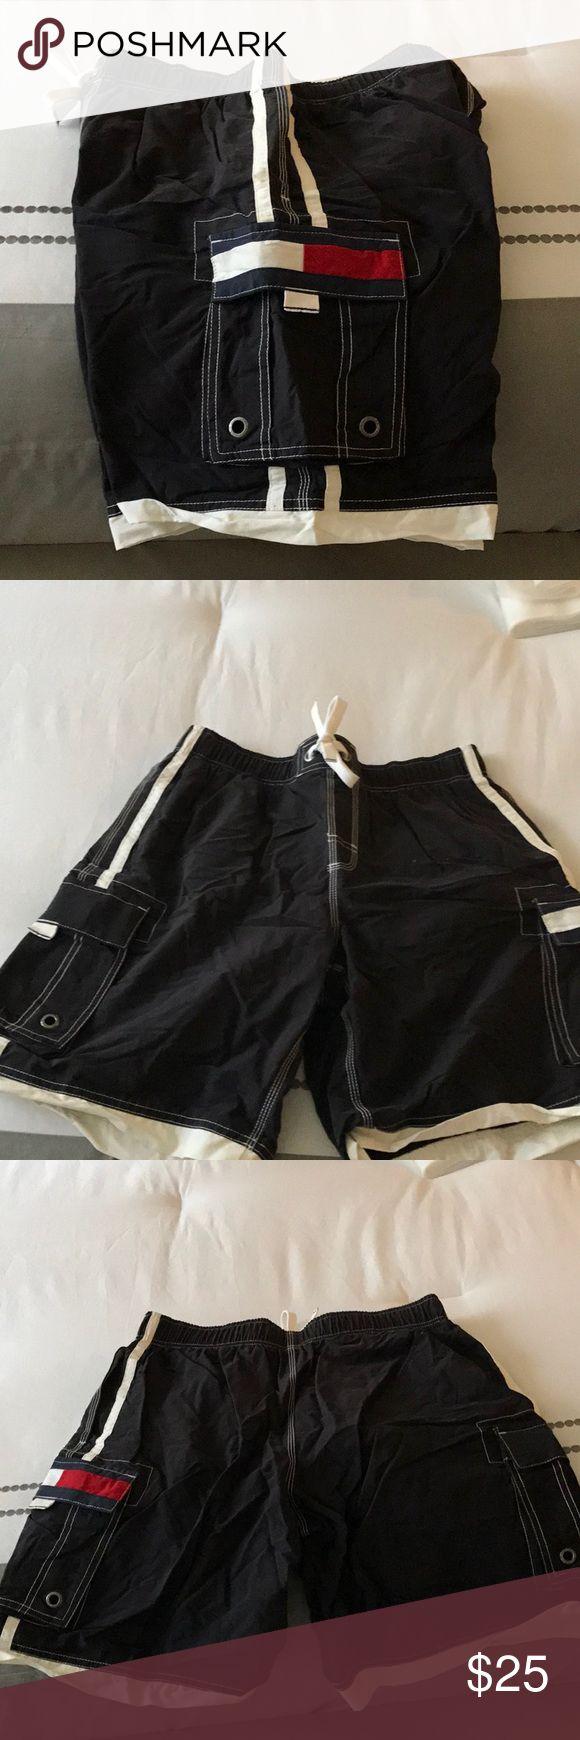 Men's Tommy Hilfiger swim trunks swimwear bathing Men's Tommy Hilfiger swimming trunks with built in underwear worn once by a woman with a bikini on sides have big pockets Tommy Hilfiger Swim Board Shorts